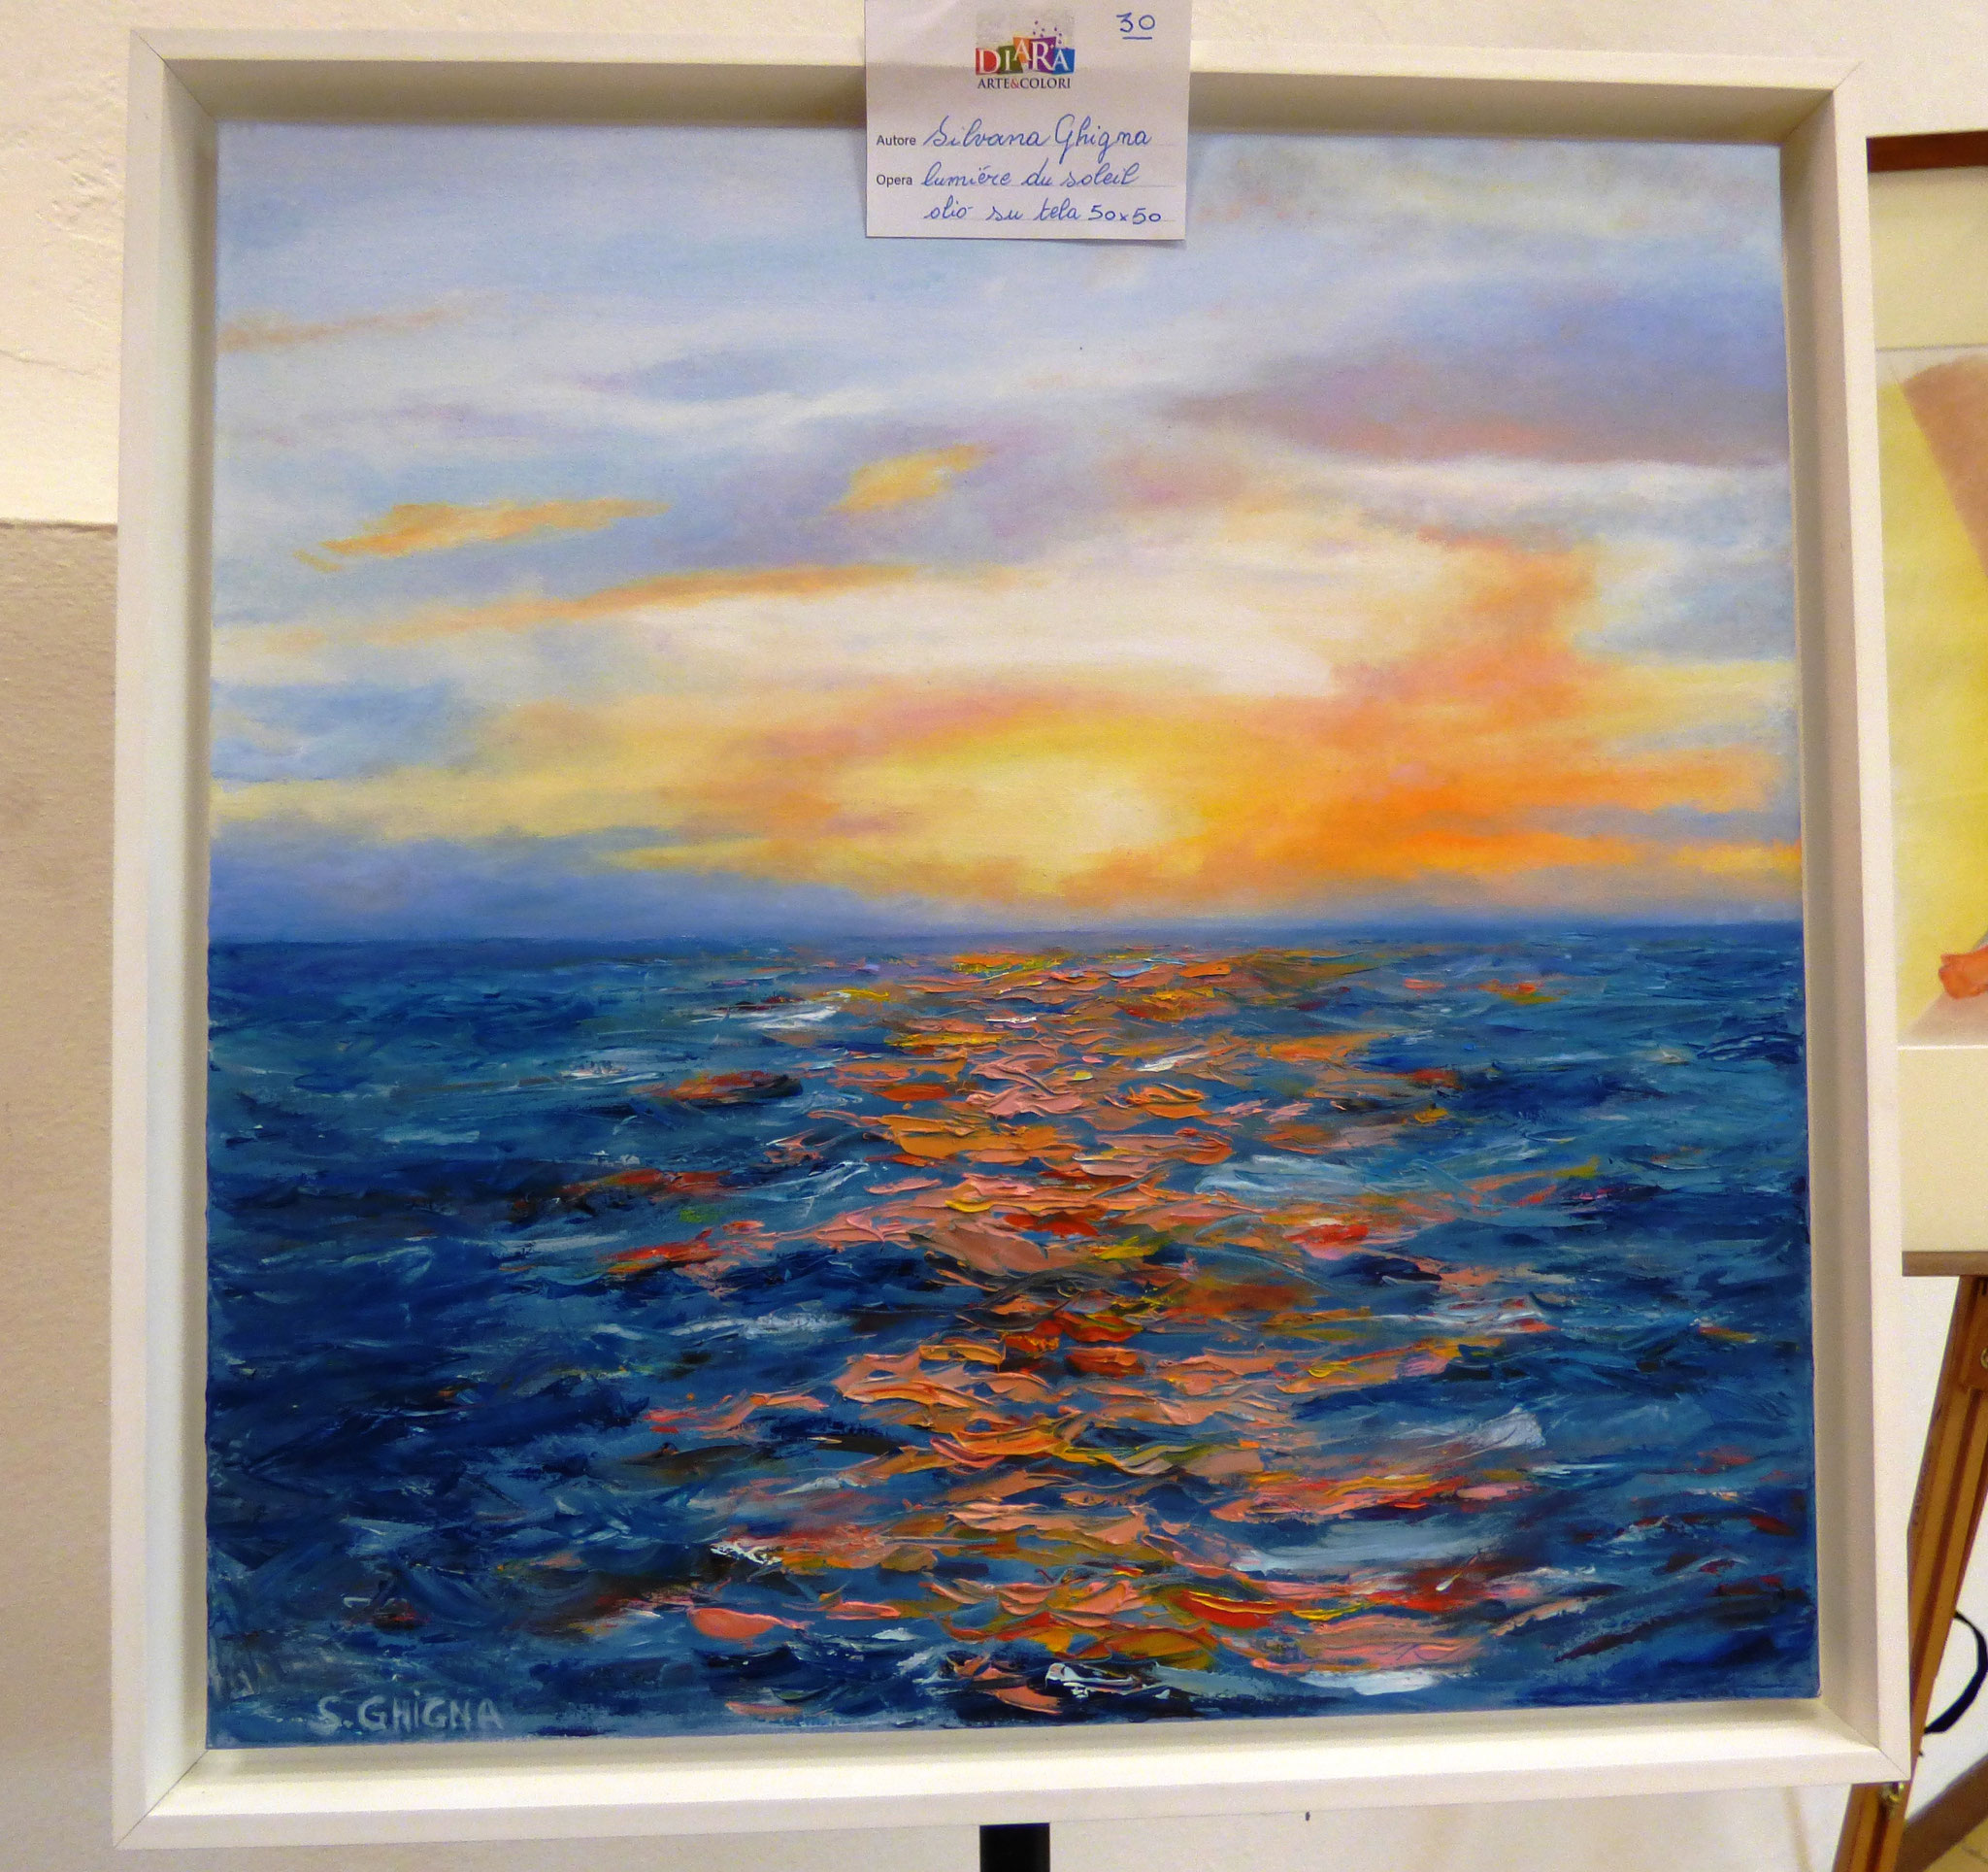 Silvana Ghigna Lumiere du soleil olio su tela 50x50